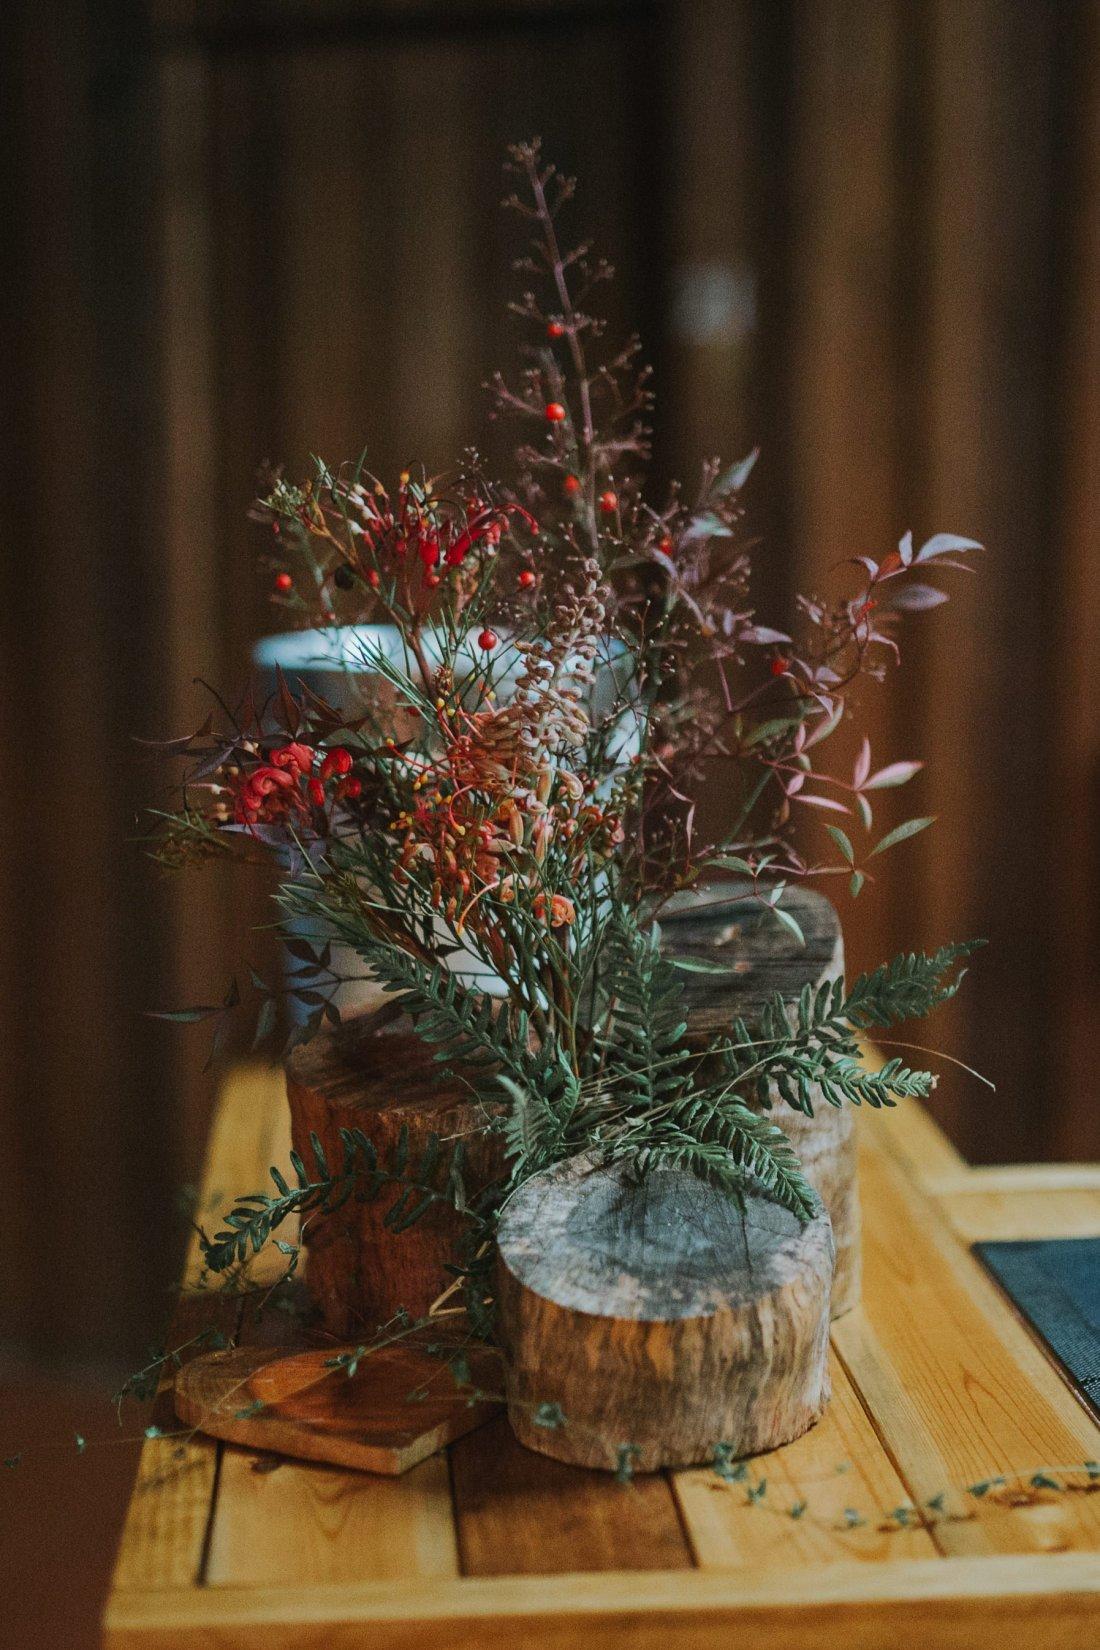 Perth Wedding Photographer | Ebony Blush Photography . | Zoe Theiadore Photography | Wedding Photography | Stevie + Jay49